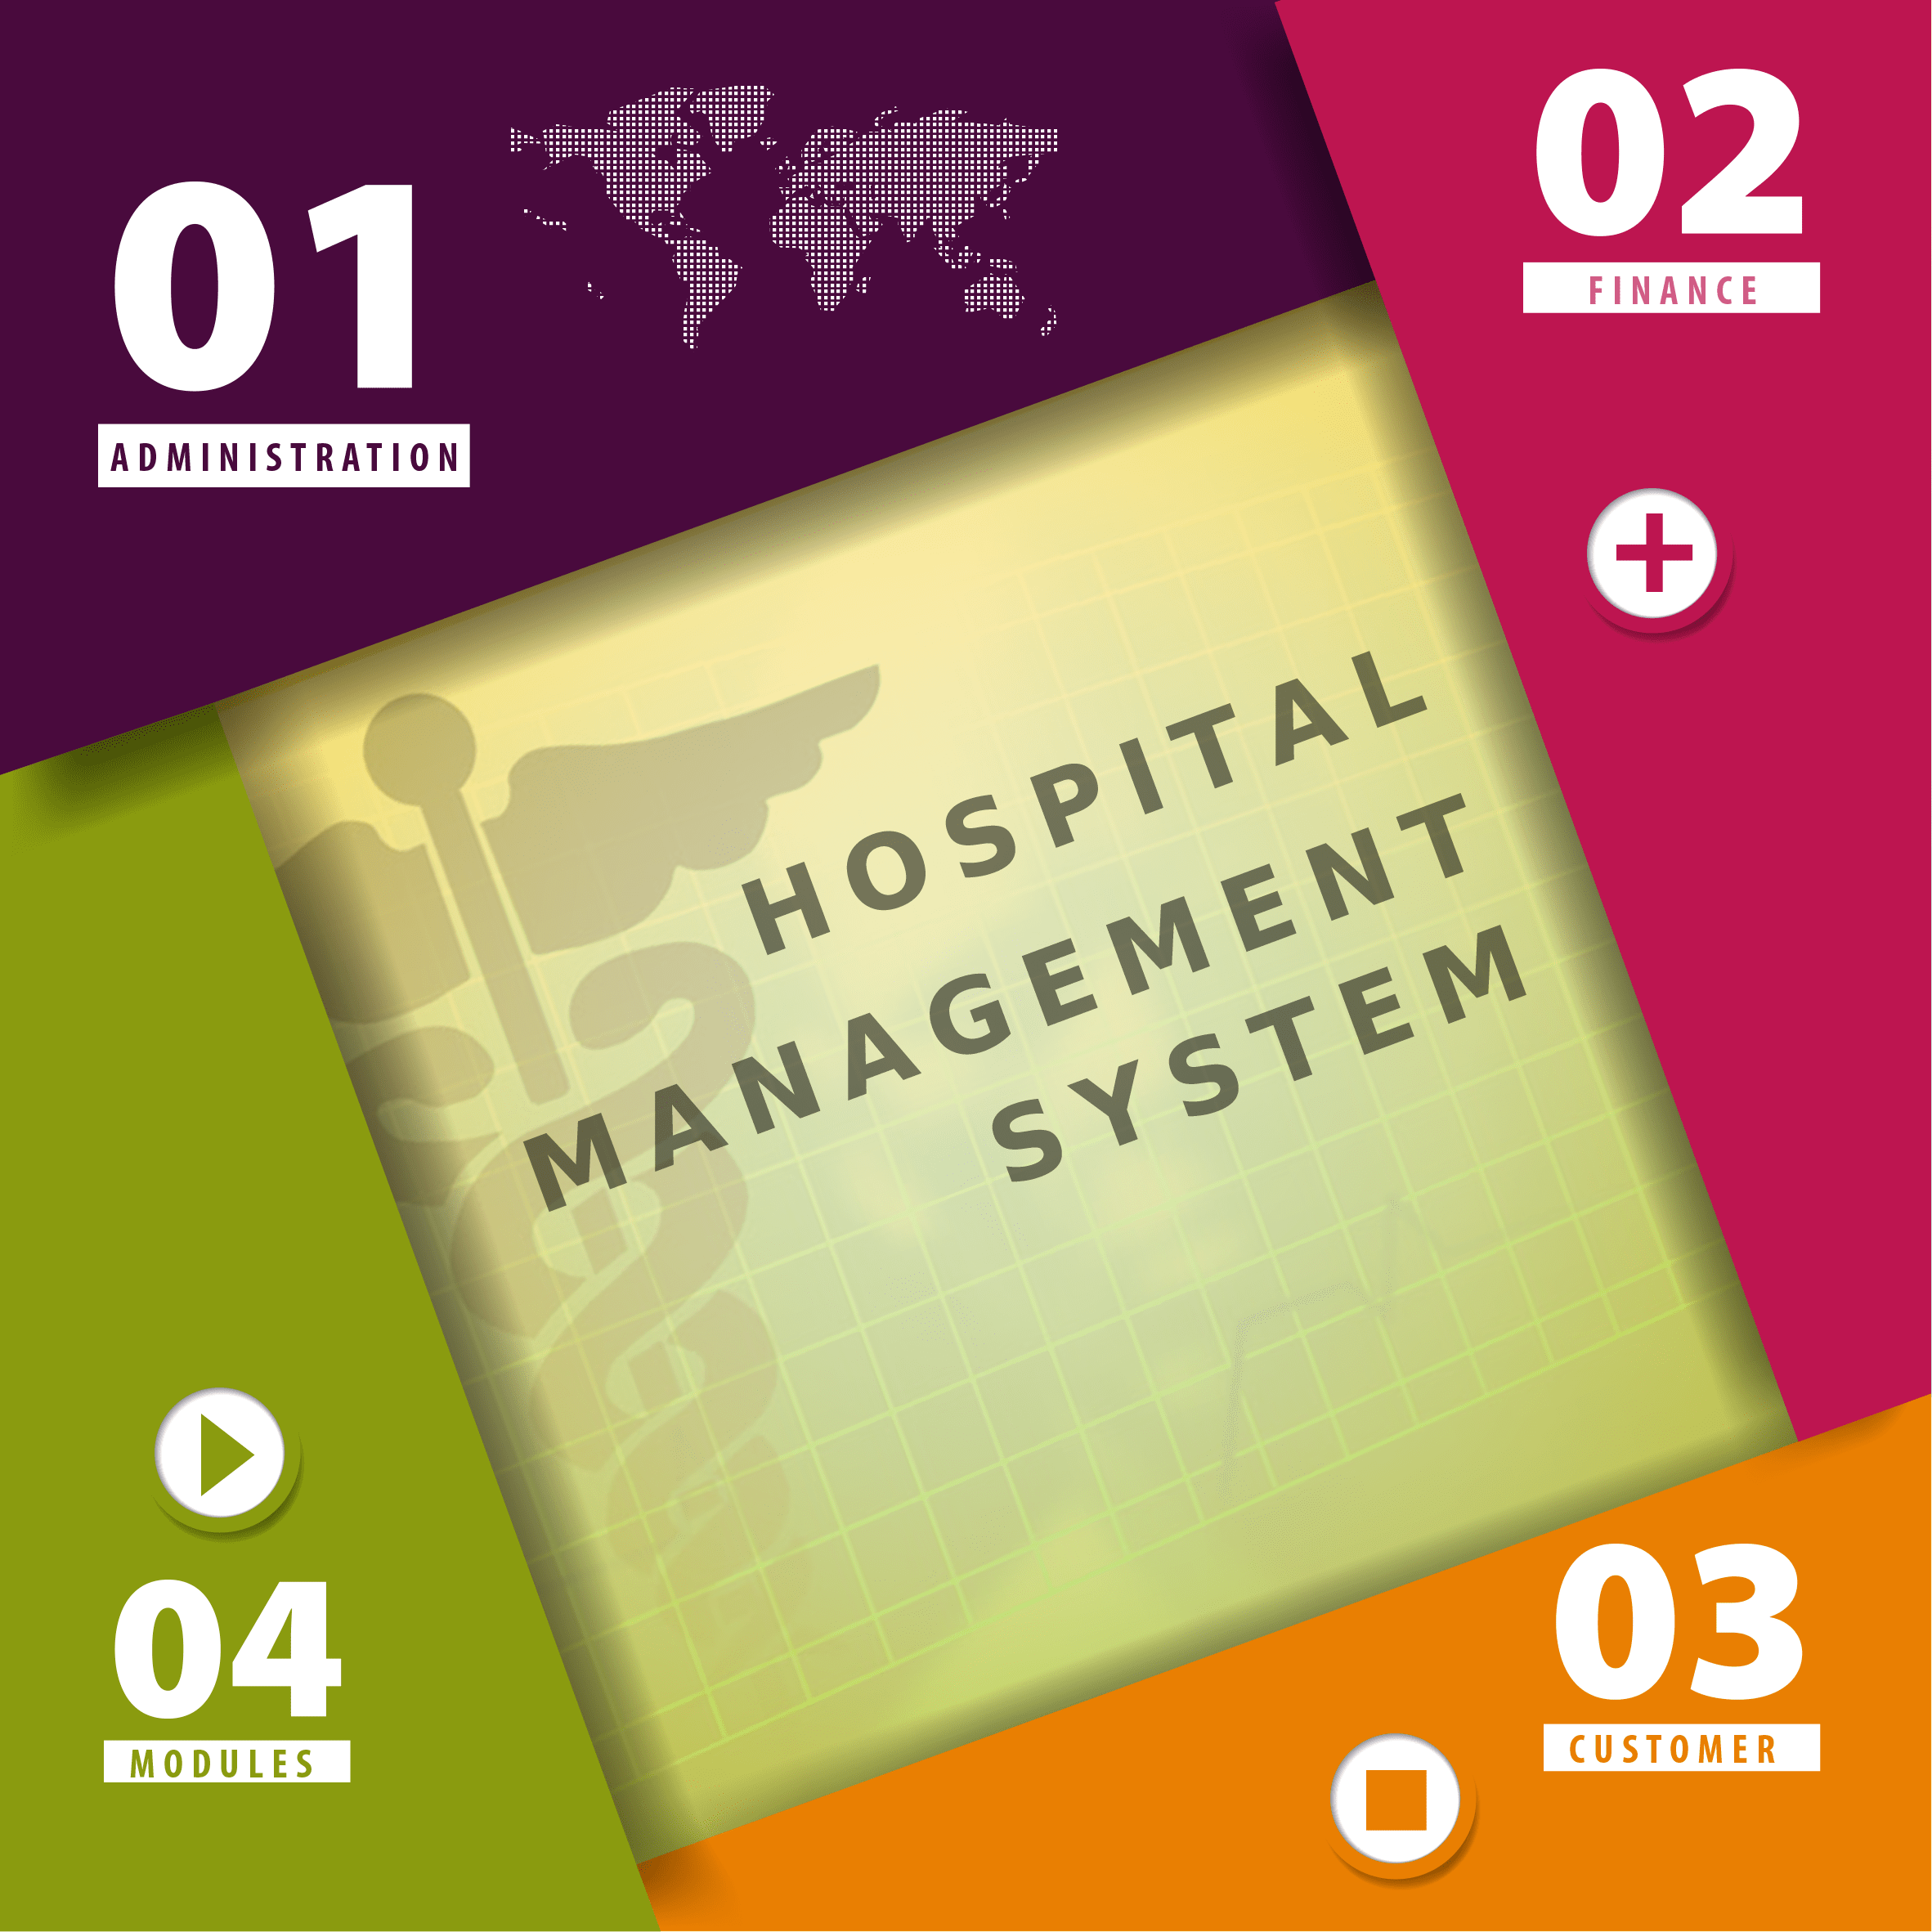 Hospital Management Software The application have